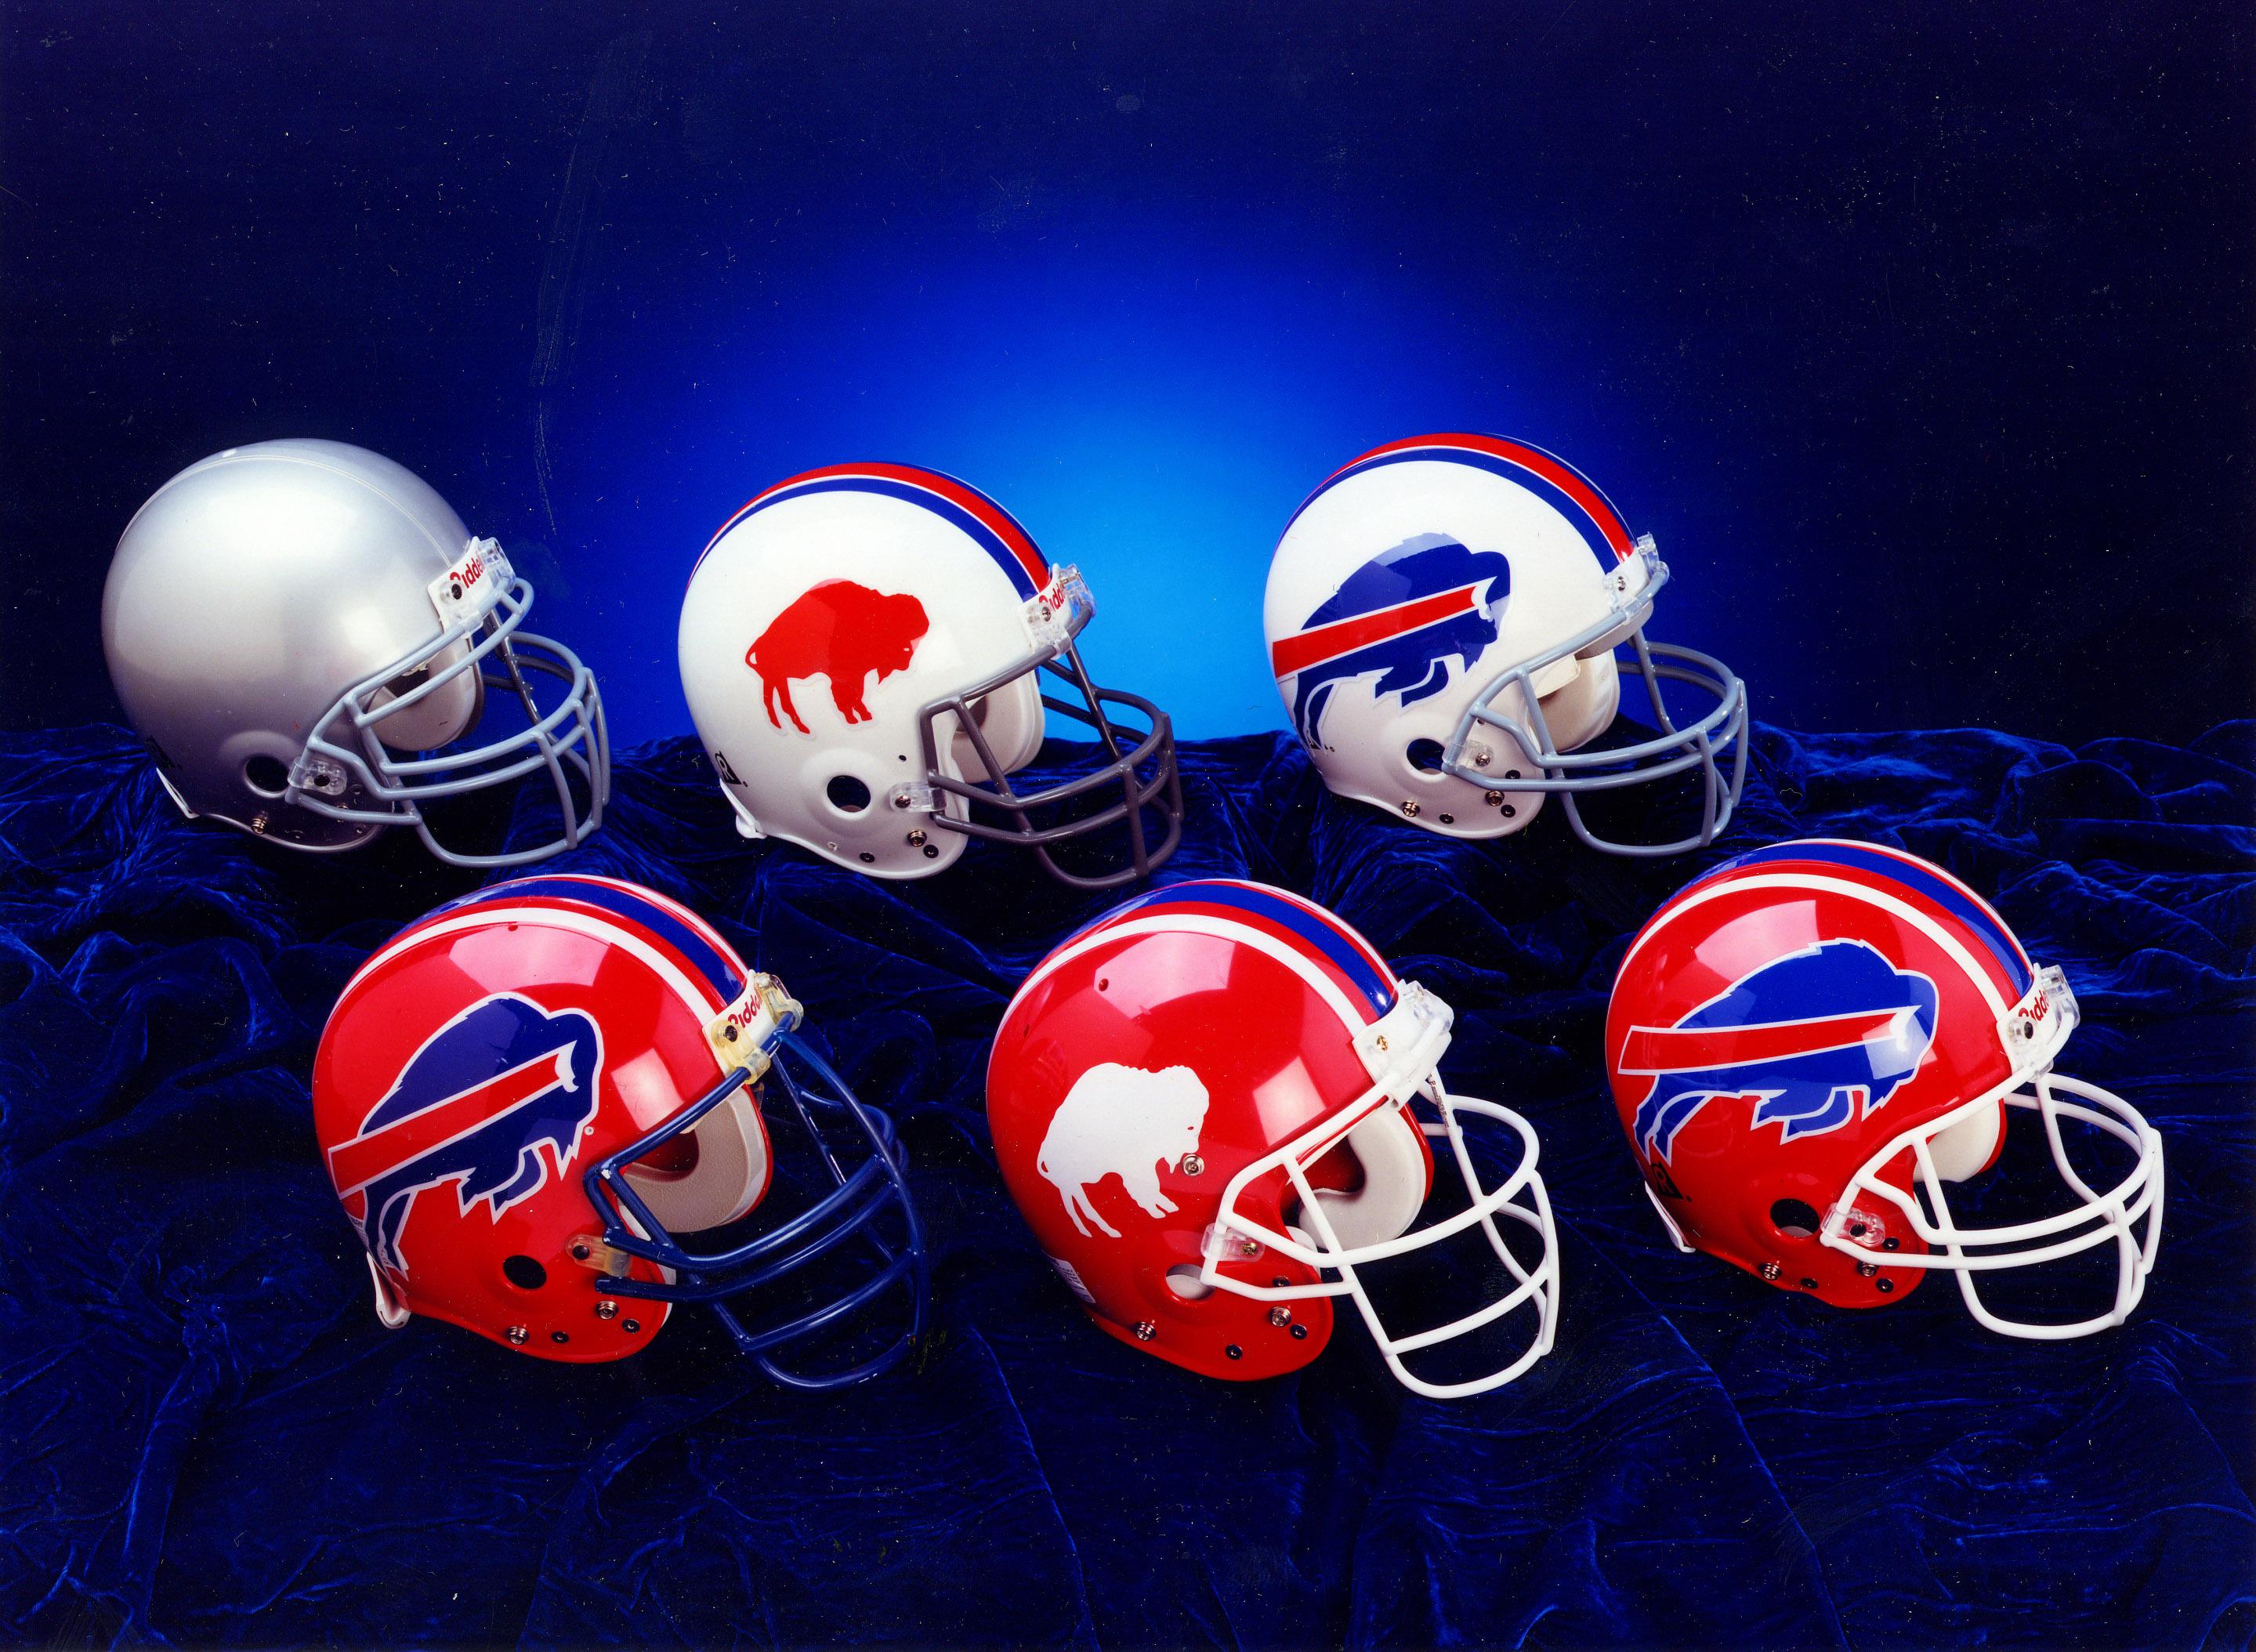 Buffalo Bills Logo Wallpaper Images Crazy Gallery 2879x2108